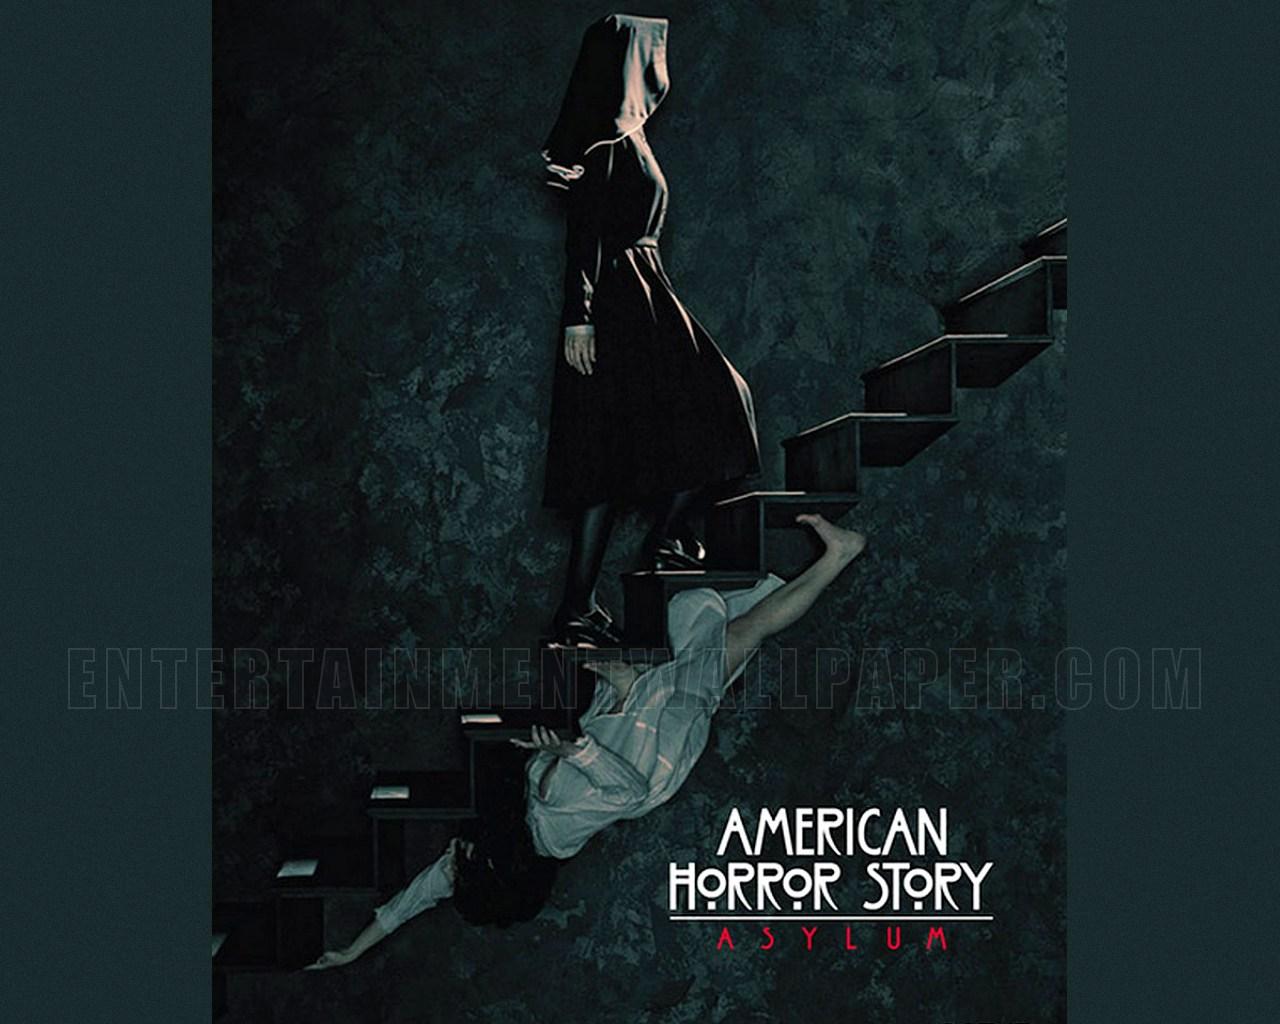 American Horror Story American Horror Story Wallpaper 1280x1024